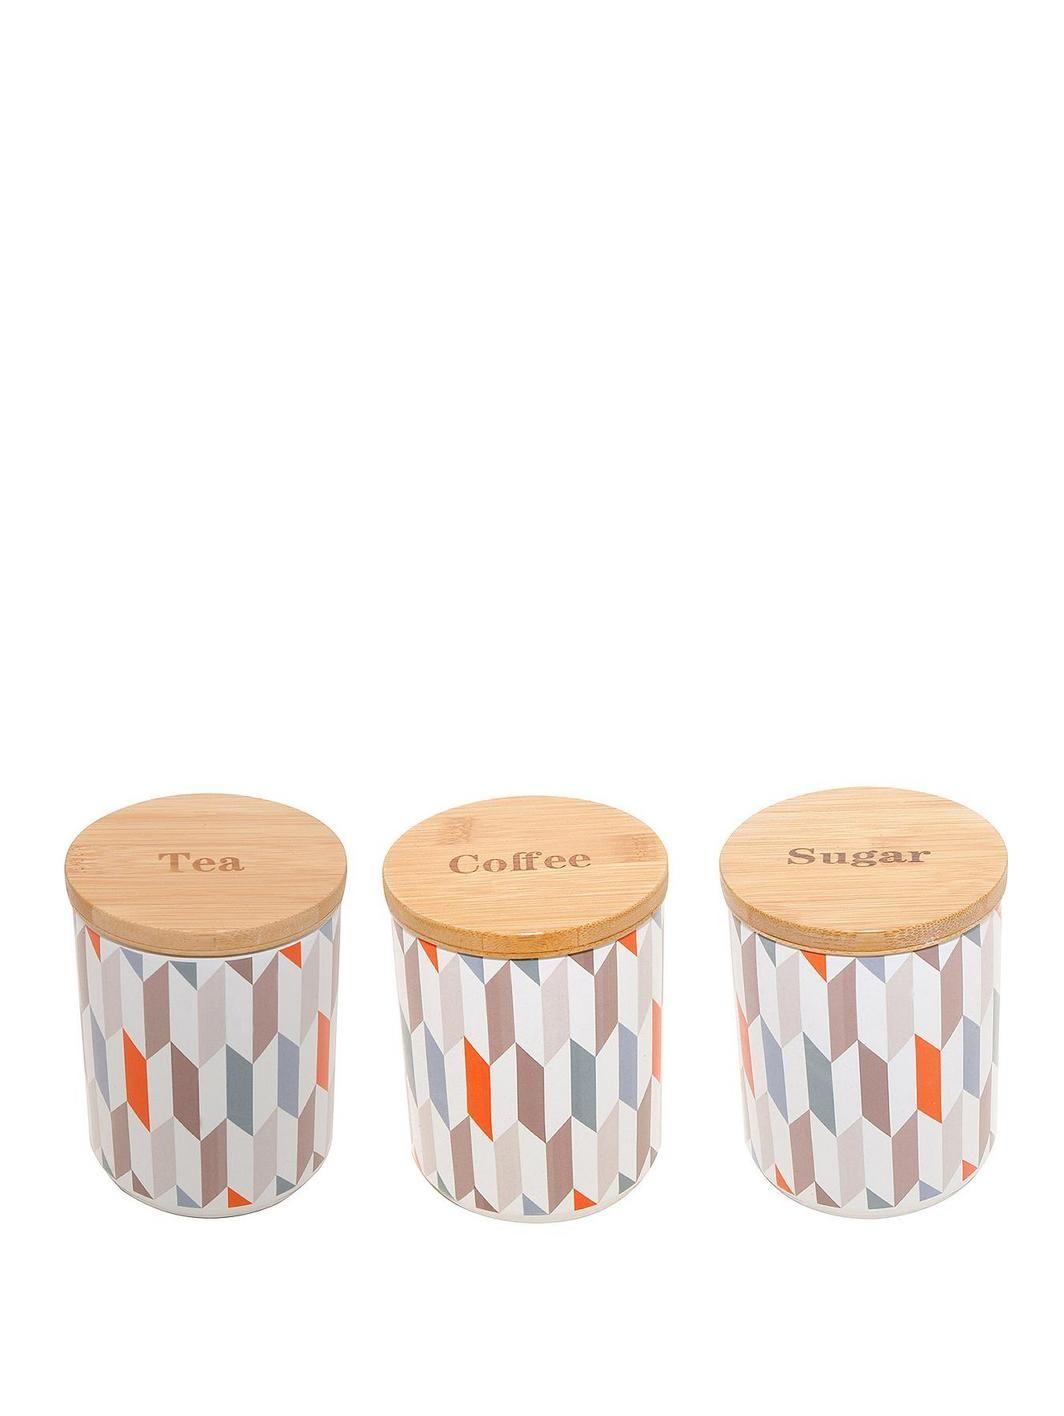 Geometric Tea Coffee And Sugar Canister Set Http Www Very Co Uk Price Kensington 1402801044 Prd